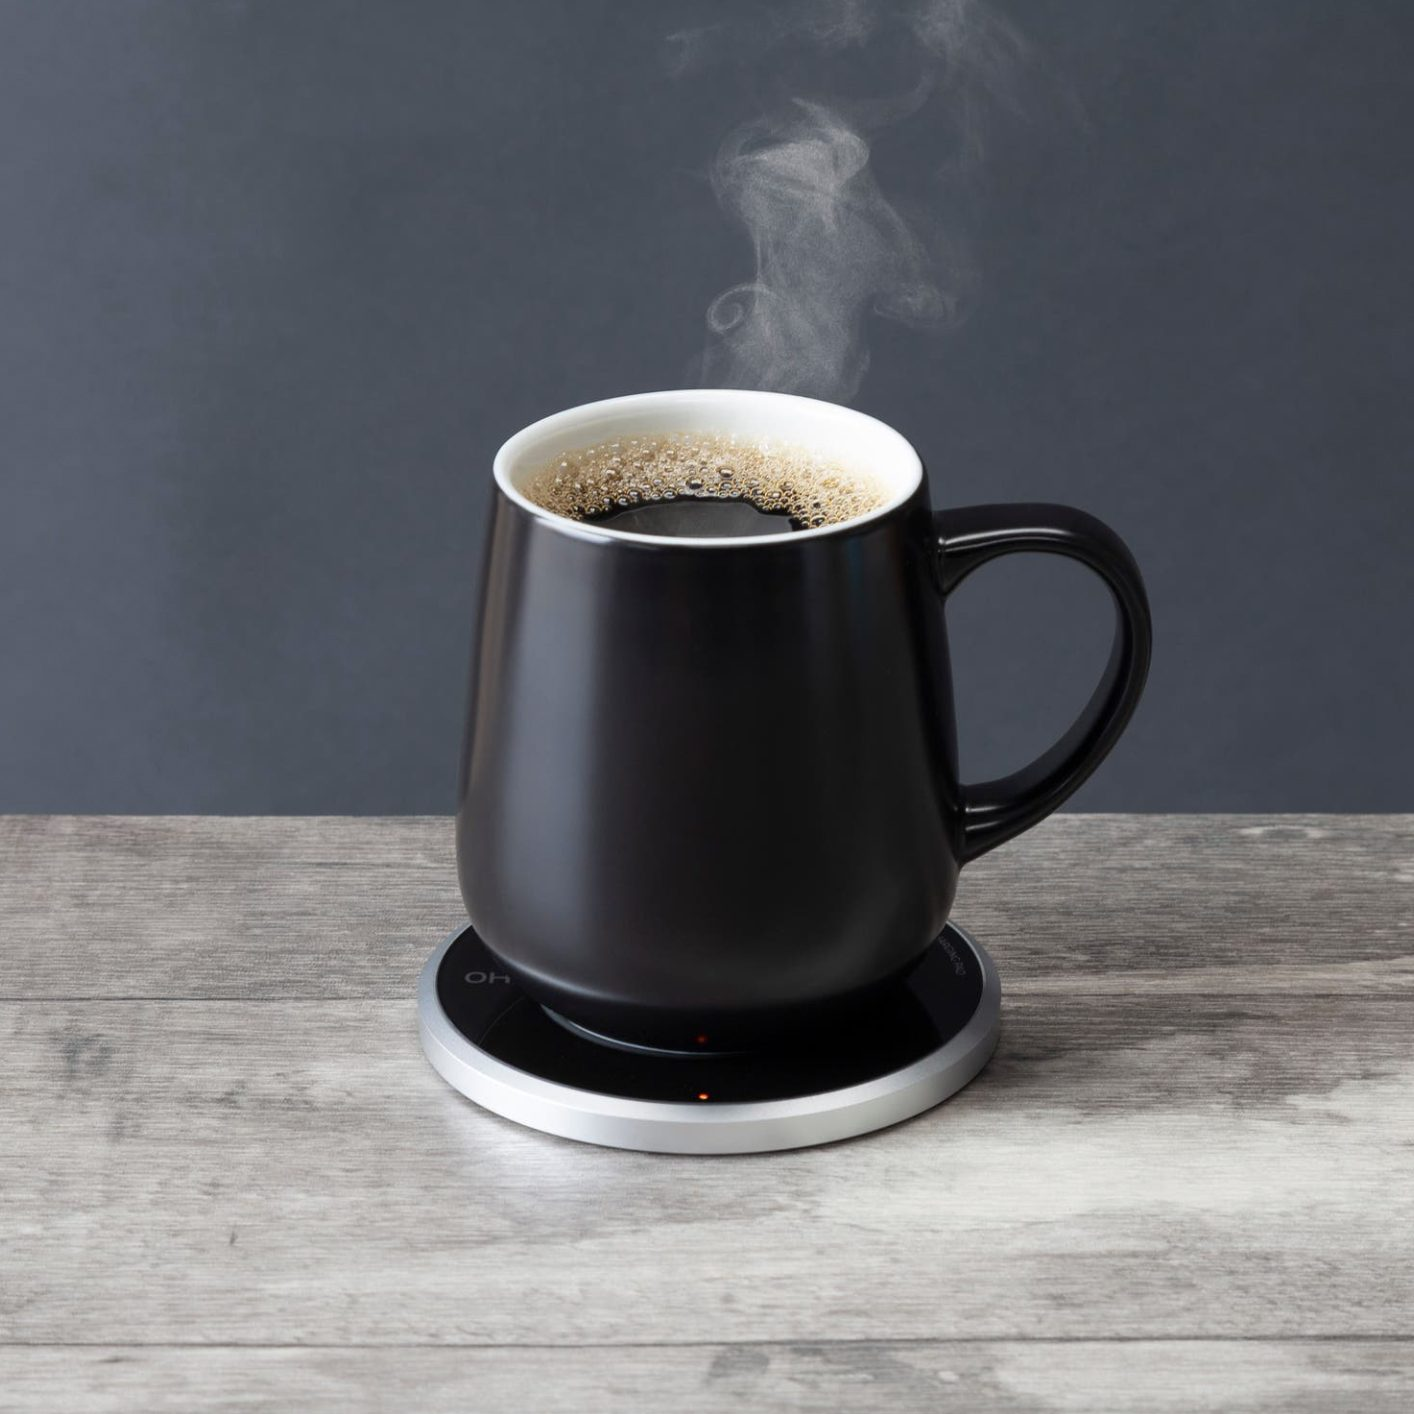 OHOM Ui Mug and Warmer Set